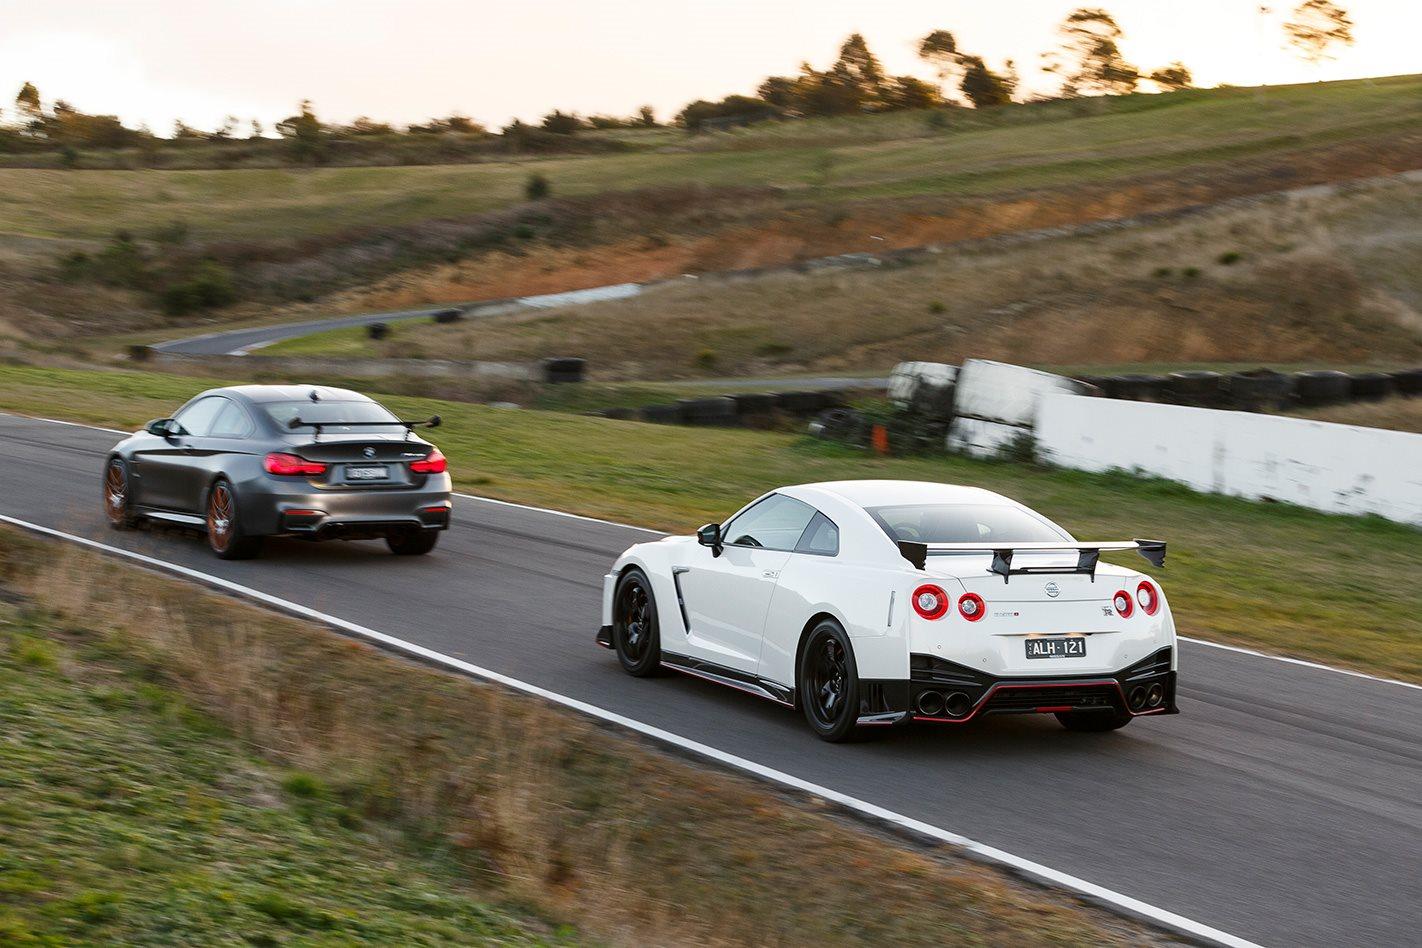 2017 Nissan GT-R NISMO vs 2017 BMW M4 GTS racetrack.jpg